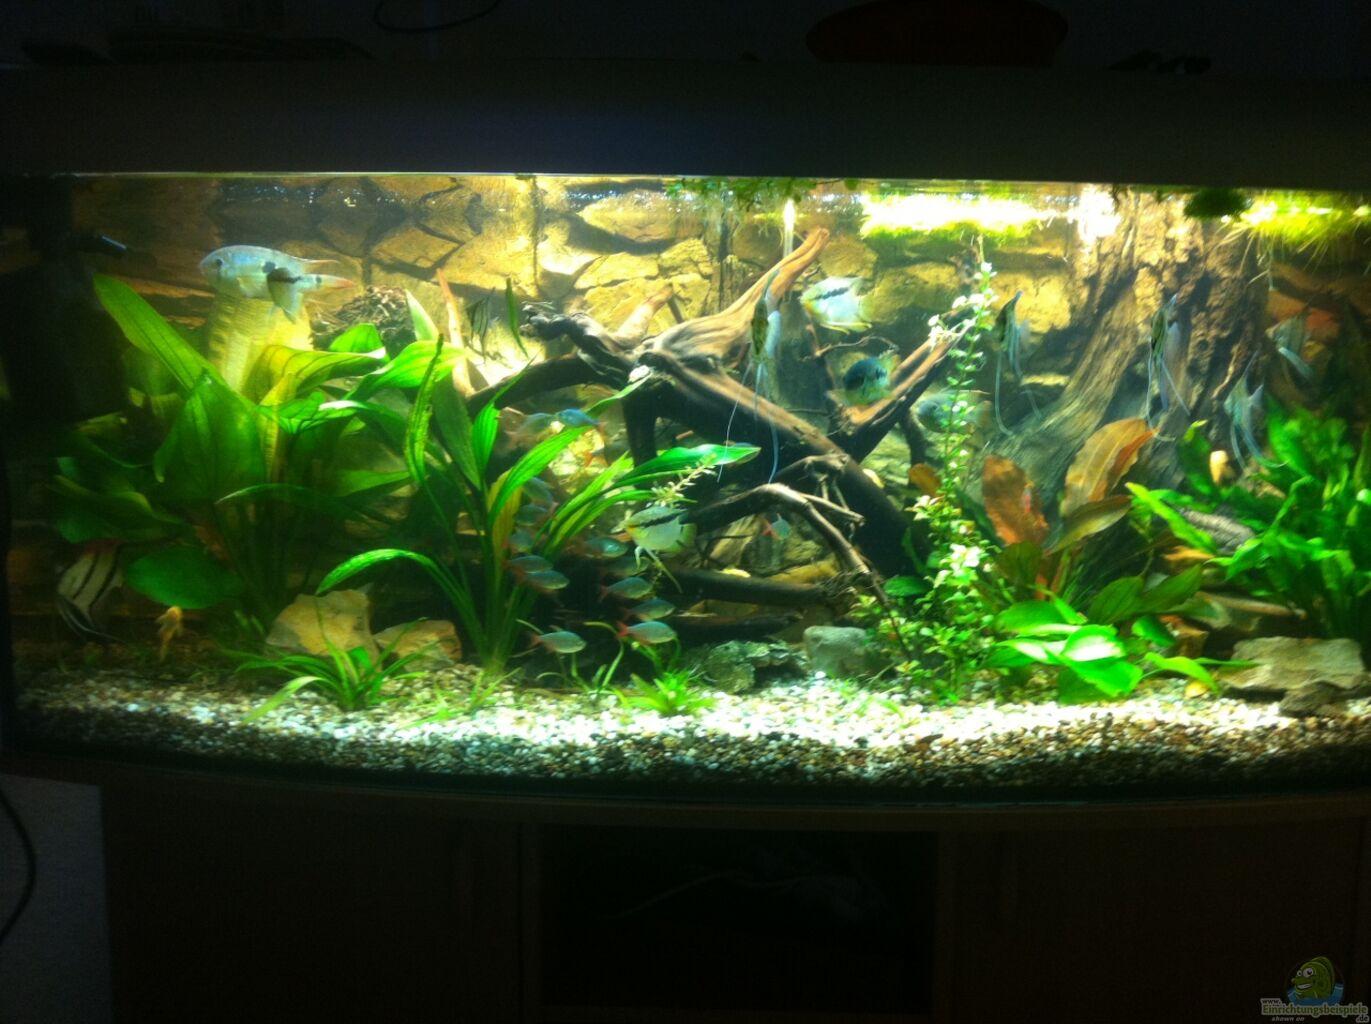 aquarium von red l mein 450l amazonasbecken. Black Bedroom Furniture Sets. Home Design Ideas